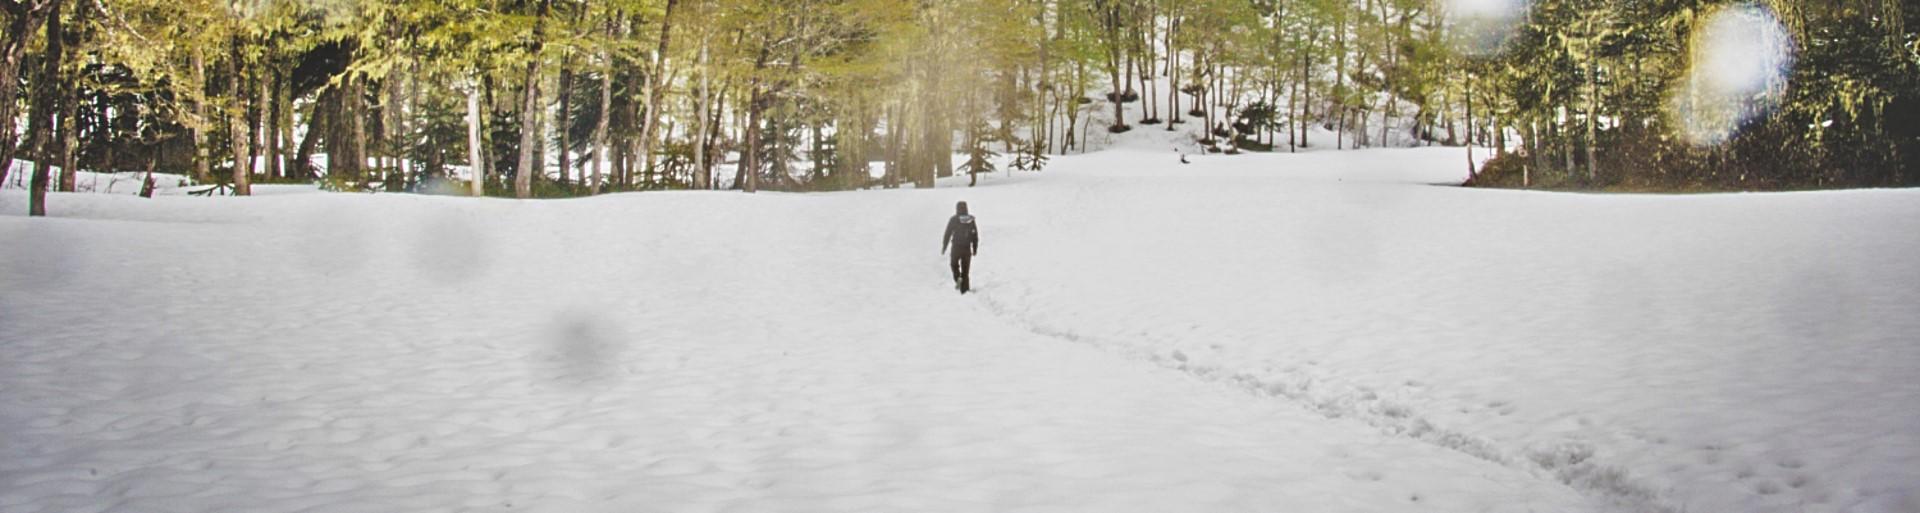 BarfussUmDieWelt-JonathanvonRosenberg-Verantwortliche-Schritt-Chile-Villarrica-Cani-Nationalpark-Wanderung-Schnee-Fußspur-barfuß-Header